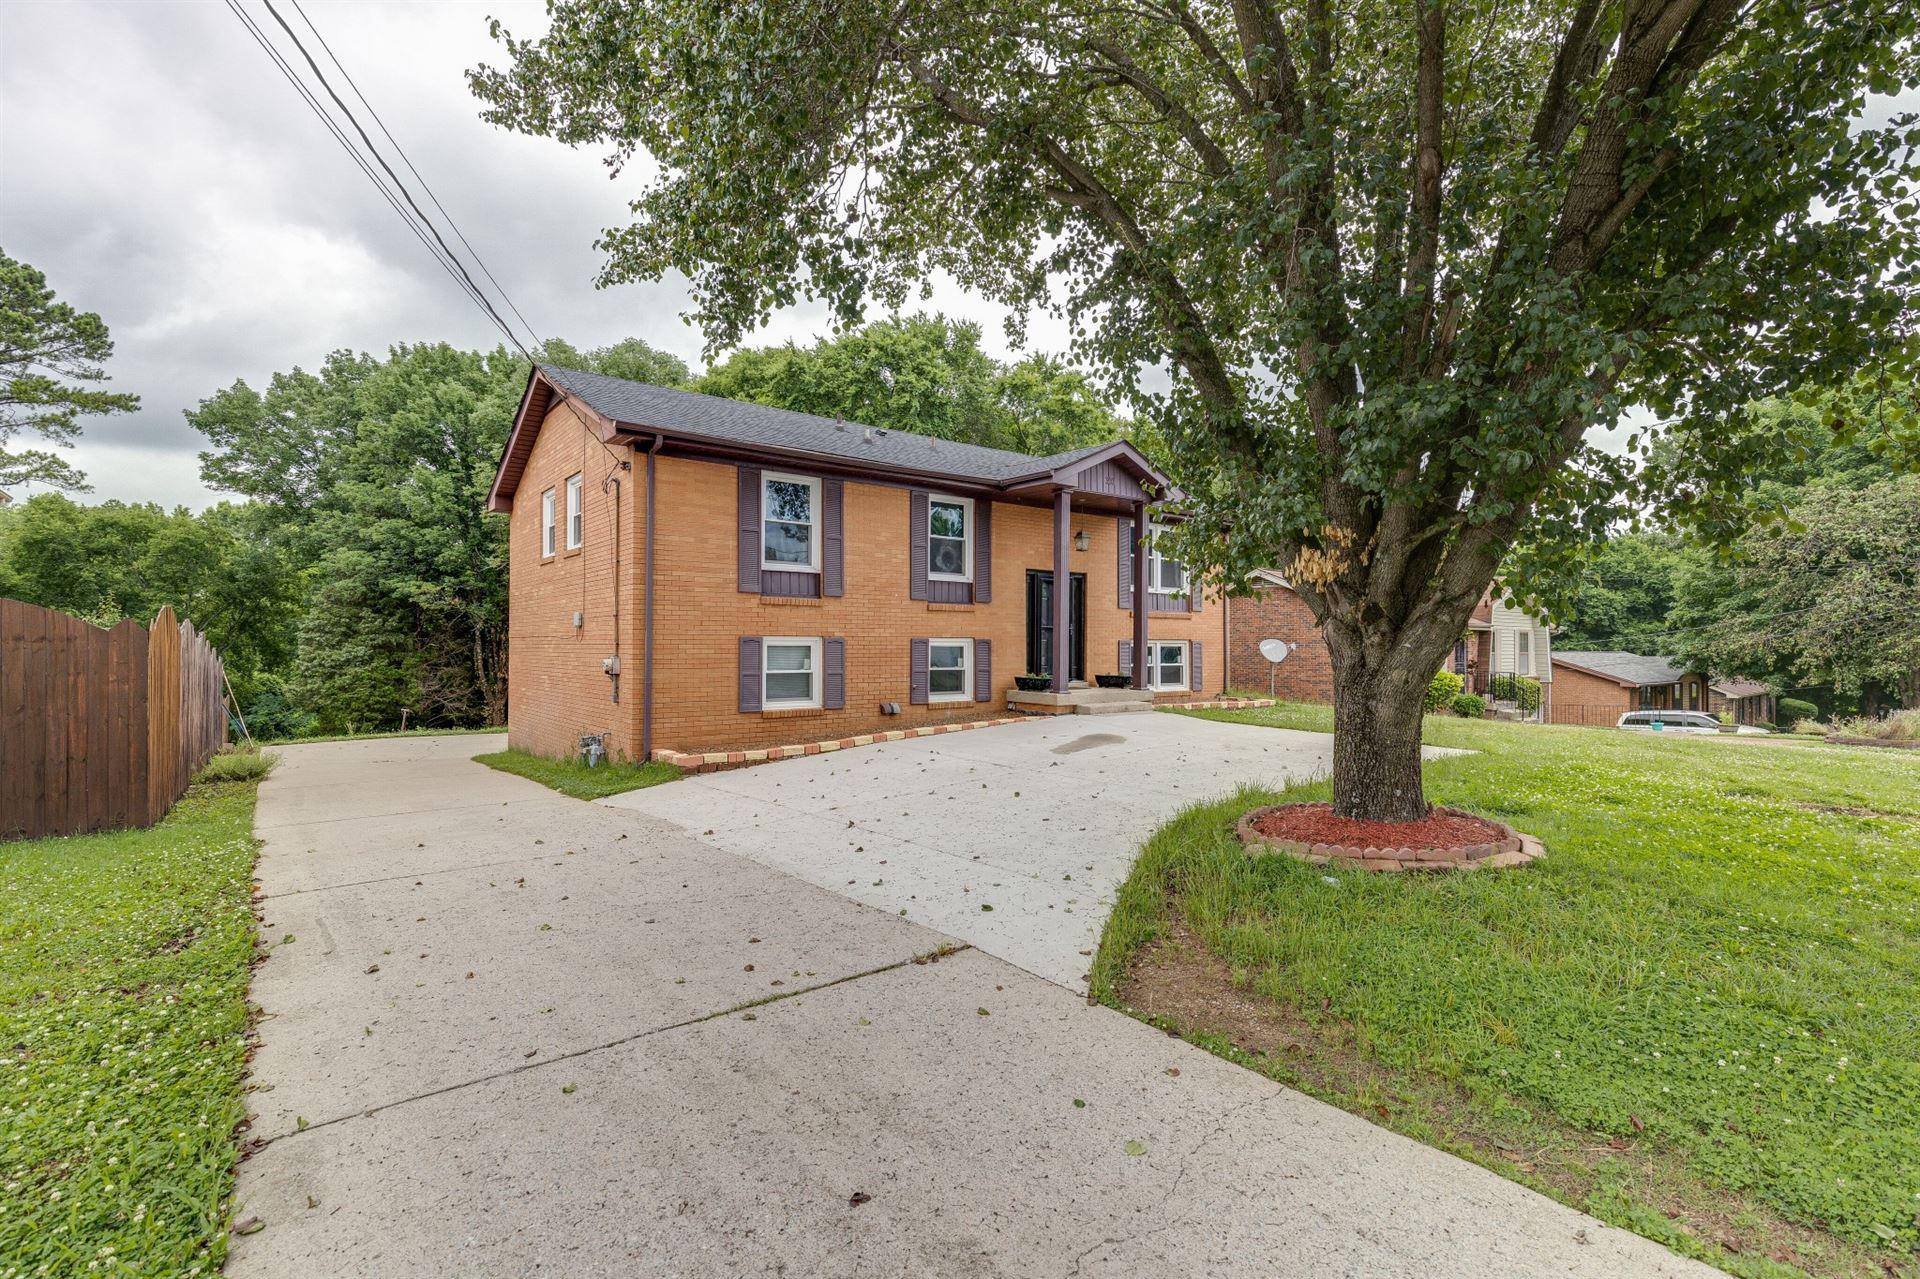 Photo of 310 Paragon Mills Rd, Nashville, TN 37211 (MLS # 2263567)